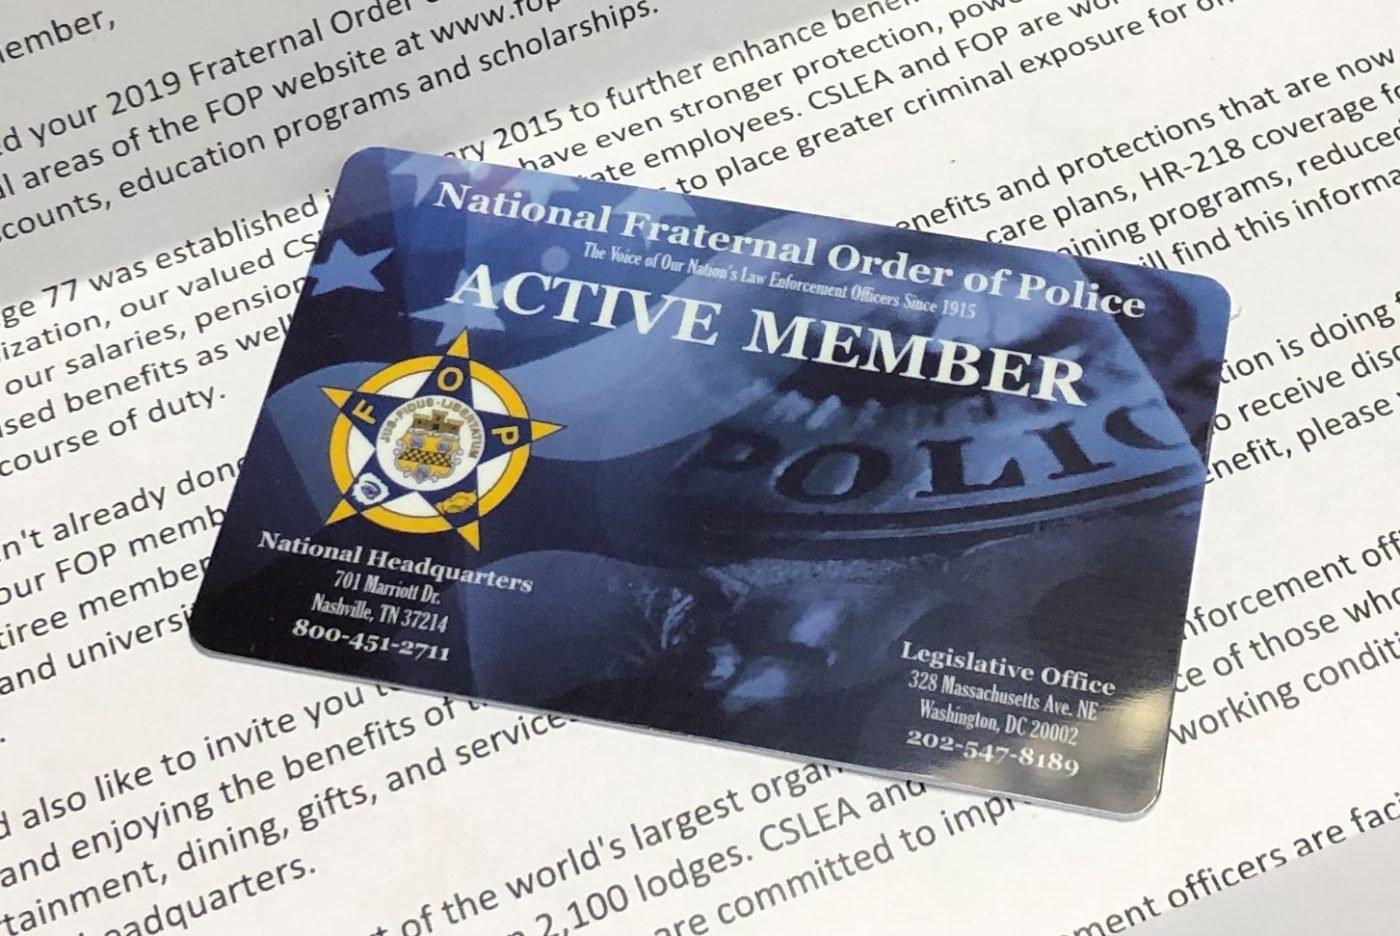 2019 Fop Membership Cards – California Statewide Law Enforcement Fop Lodge 7 Calendar 2019